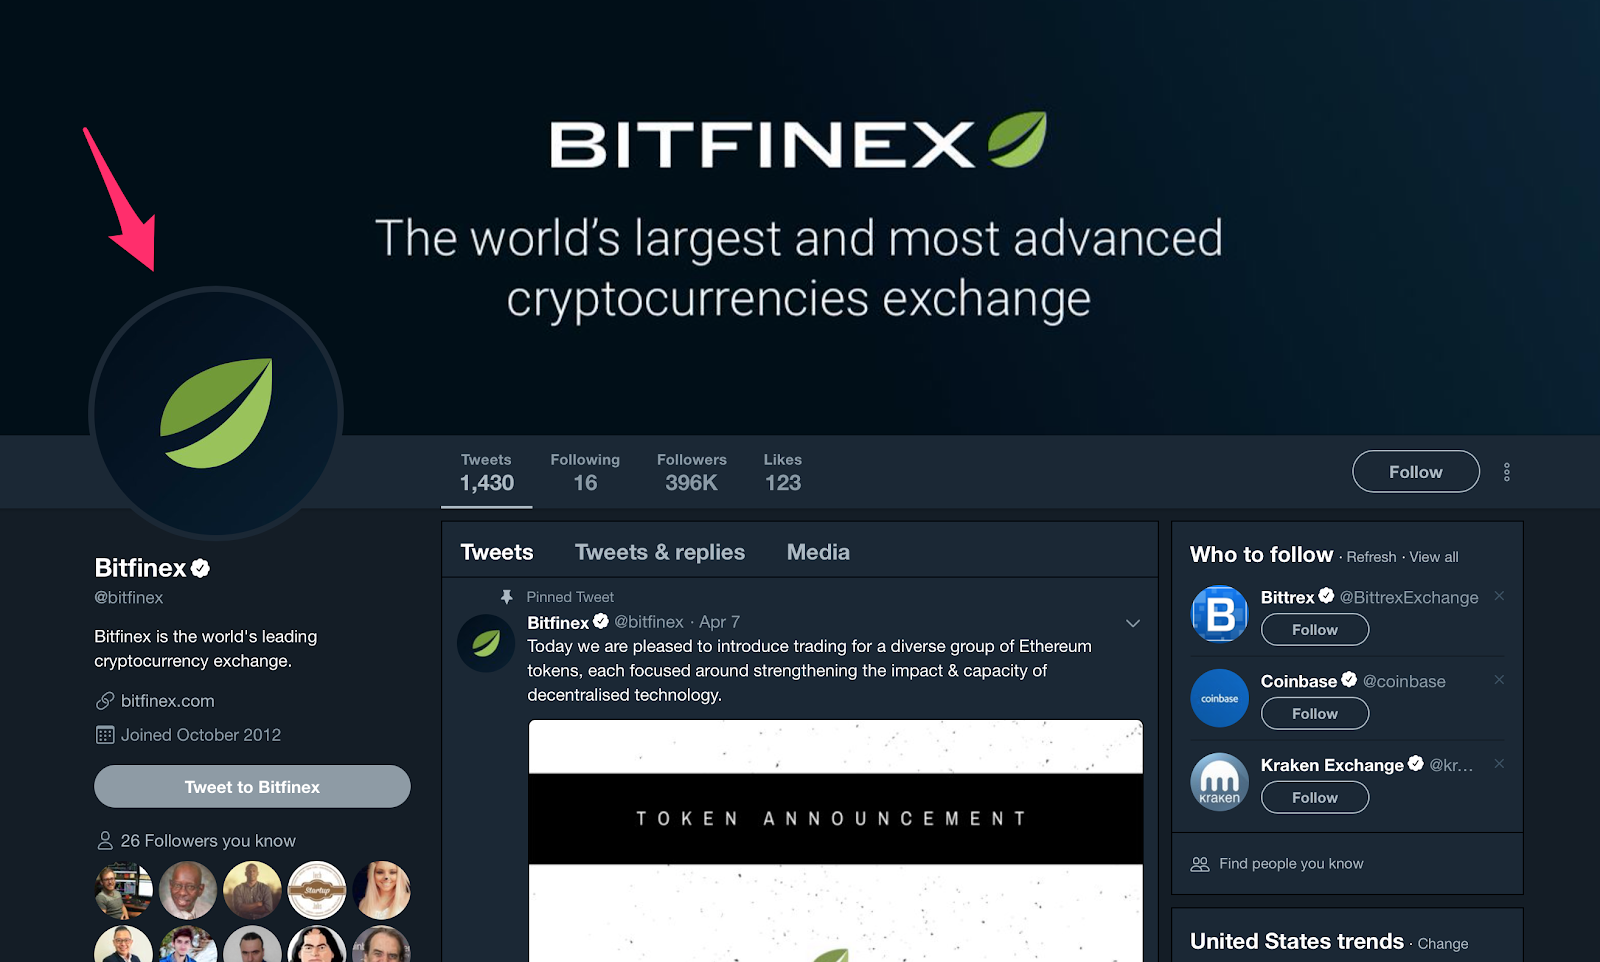 Bitfinex bitfinex Twitter